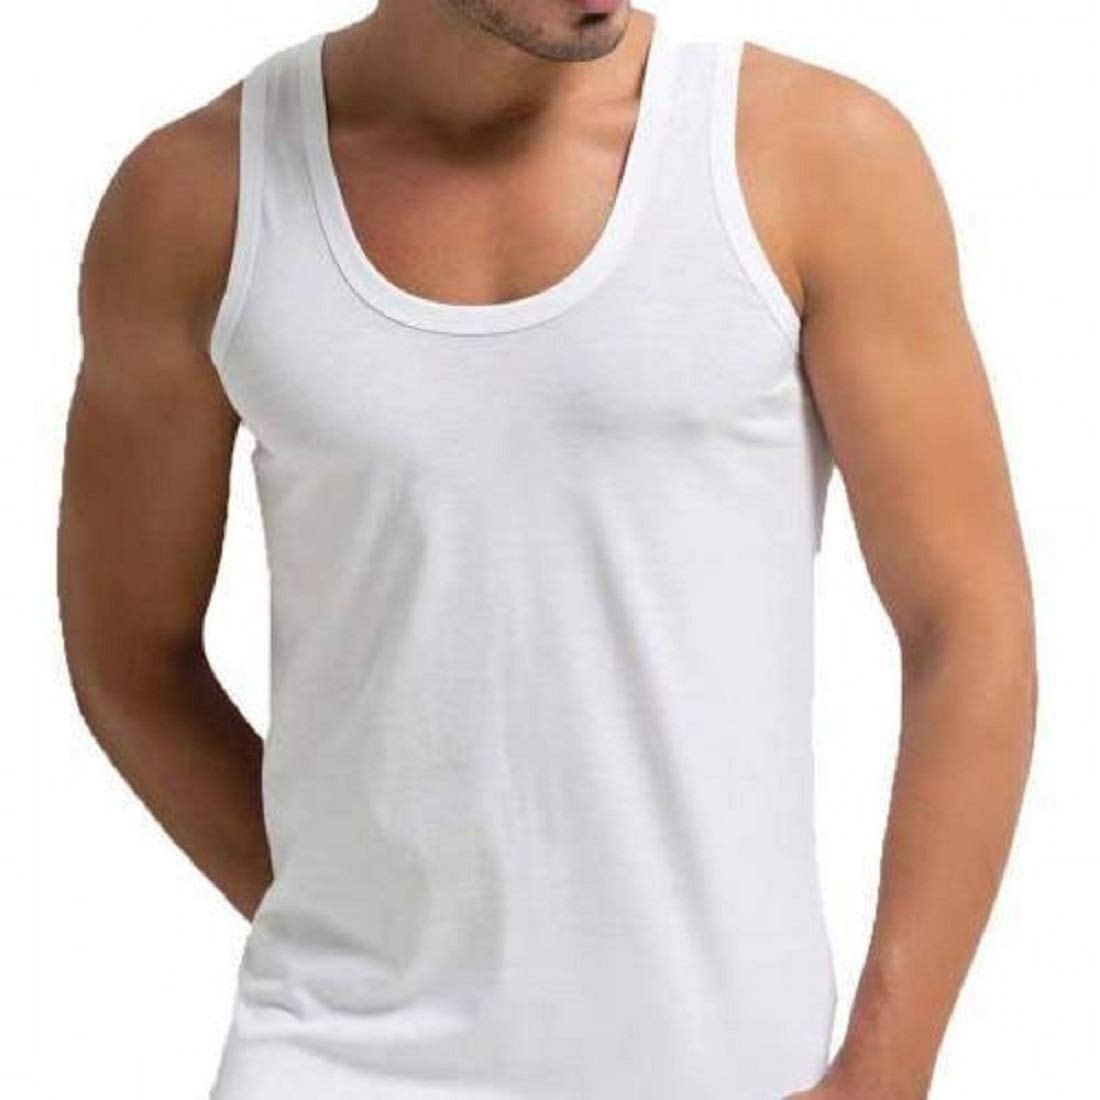 Beylem Mens Vest 100% Cotton Singlet Vests Underwear Pack of 3 Mens Vest